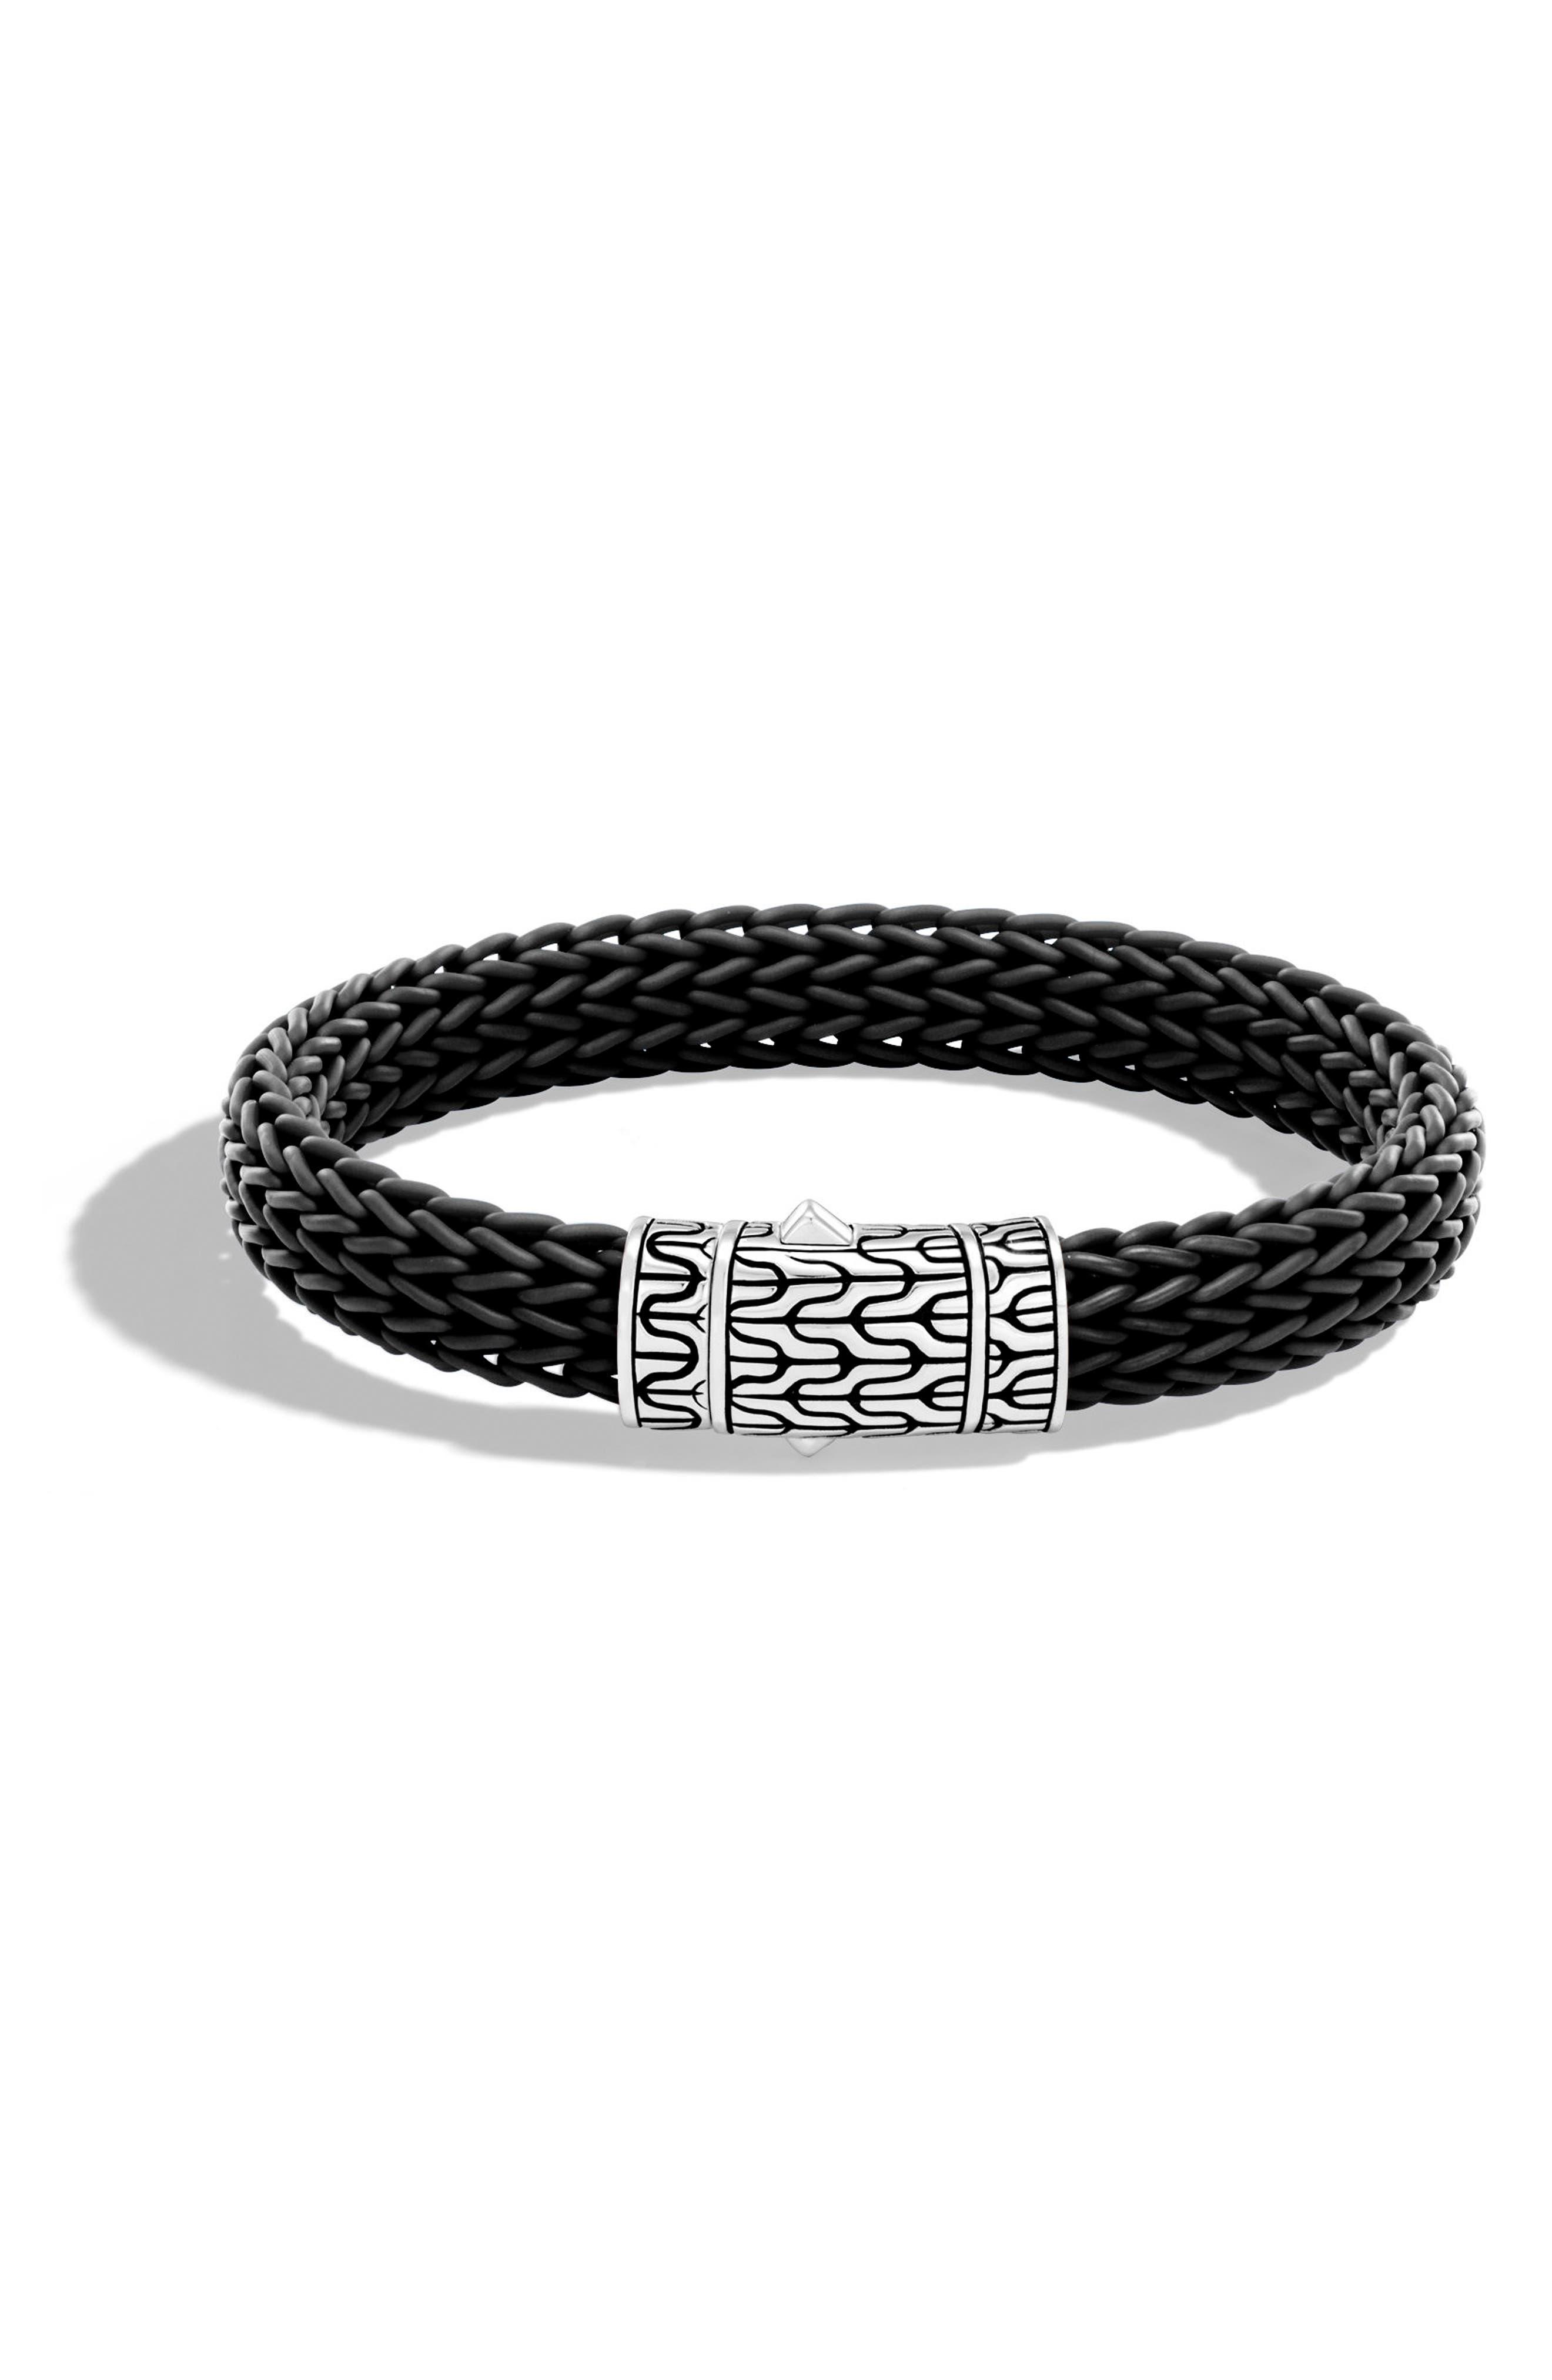 Classic Silver Rubber Chain Bracelet,                         Main,                         color, Silver/ Black